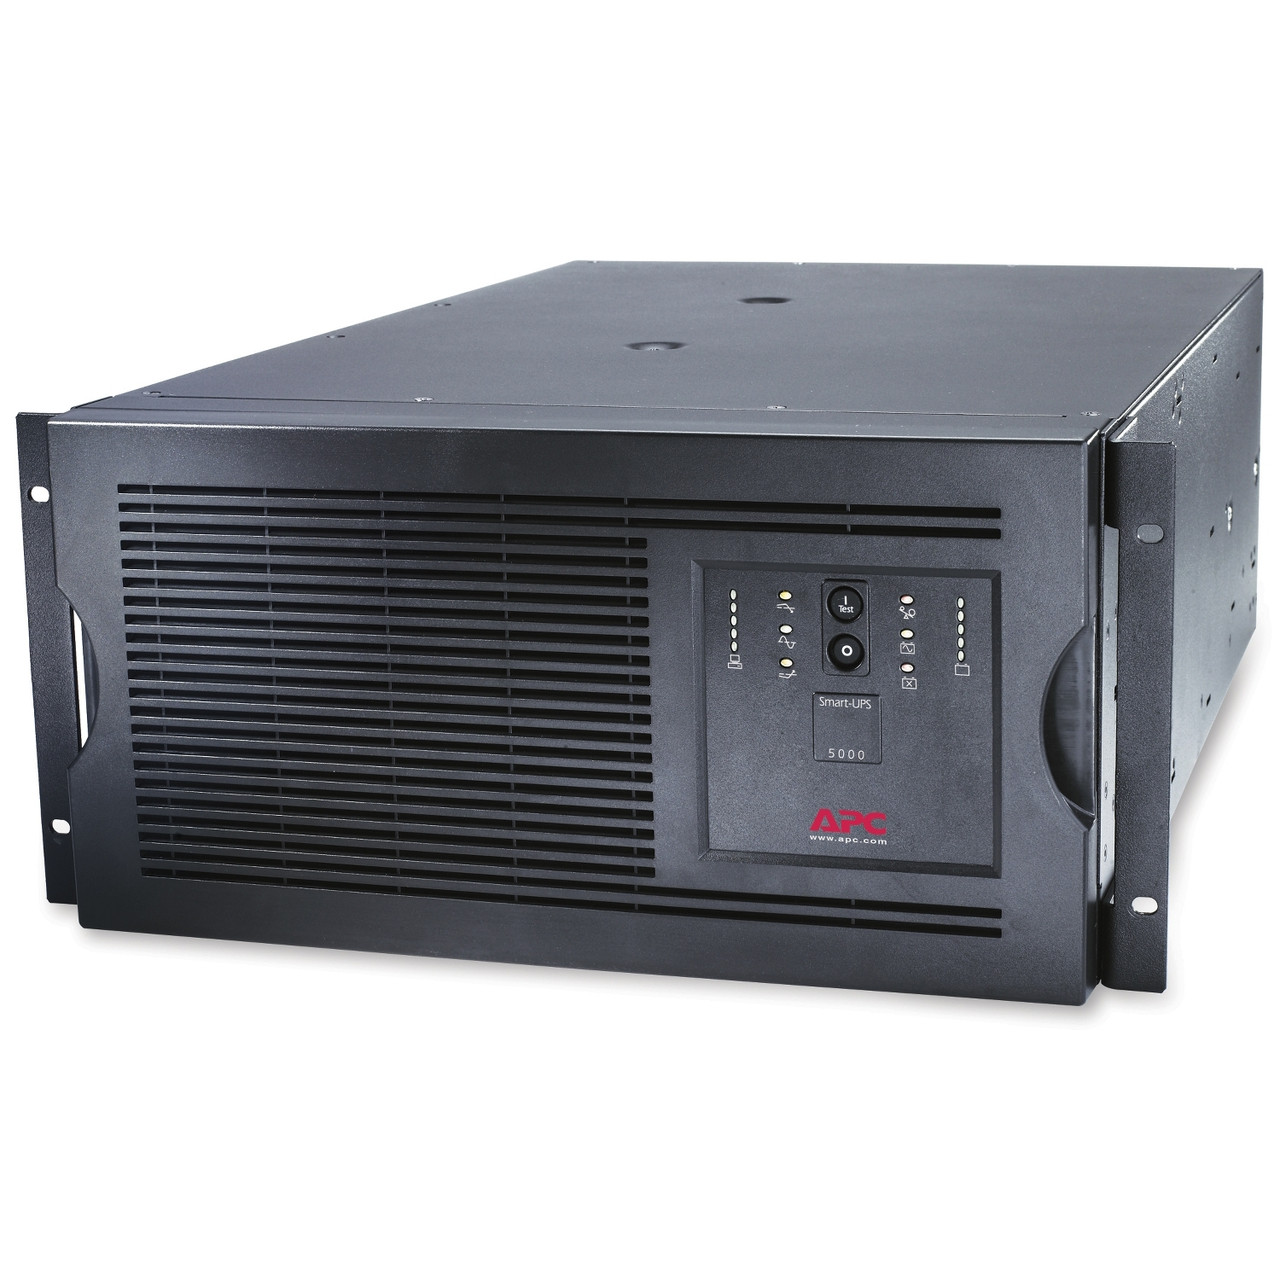 SUA5000RMI5U APC Smart-UPS 5000VA Rack/ Tower